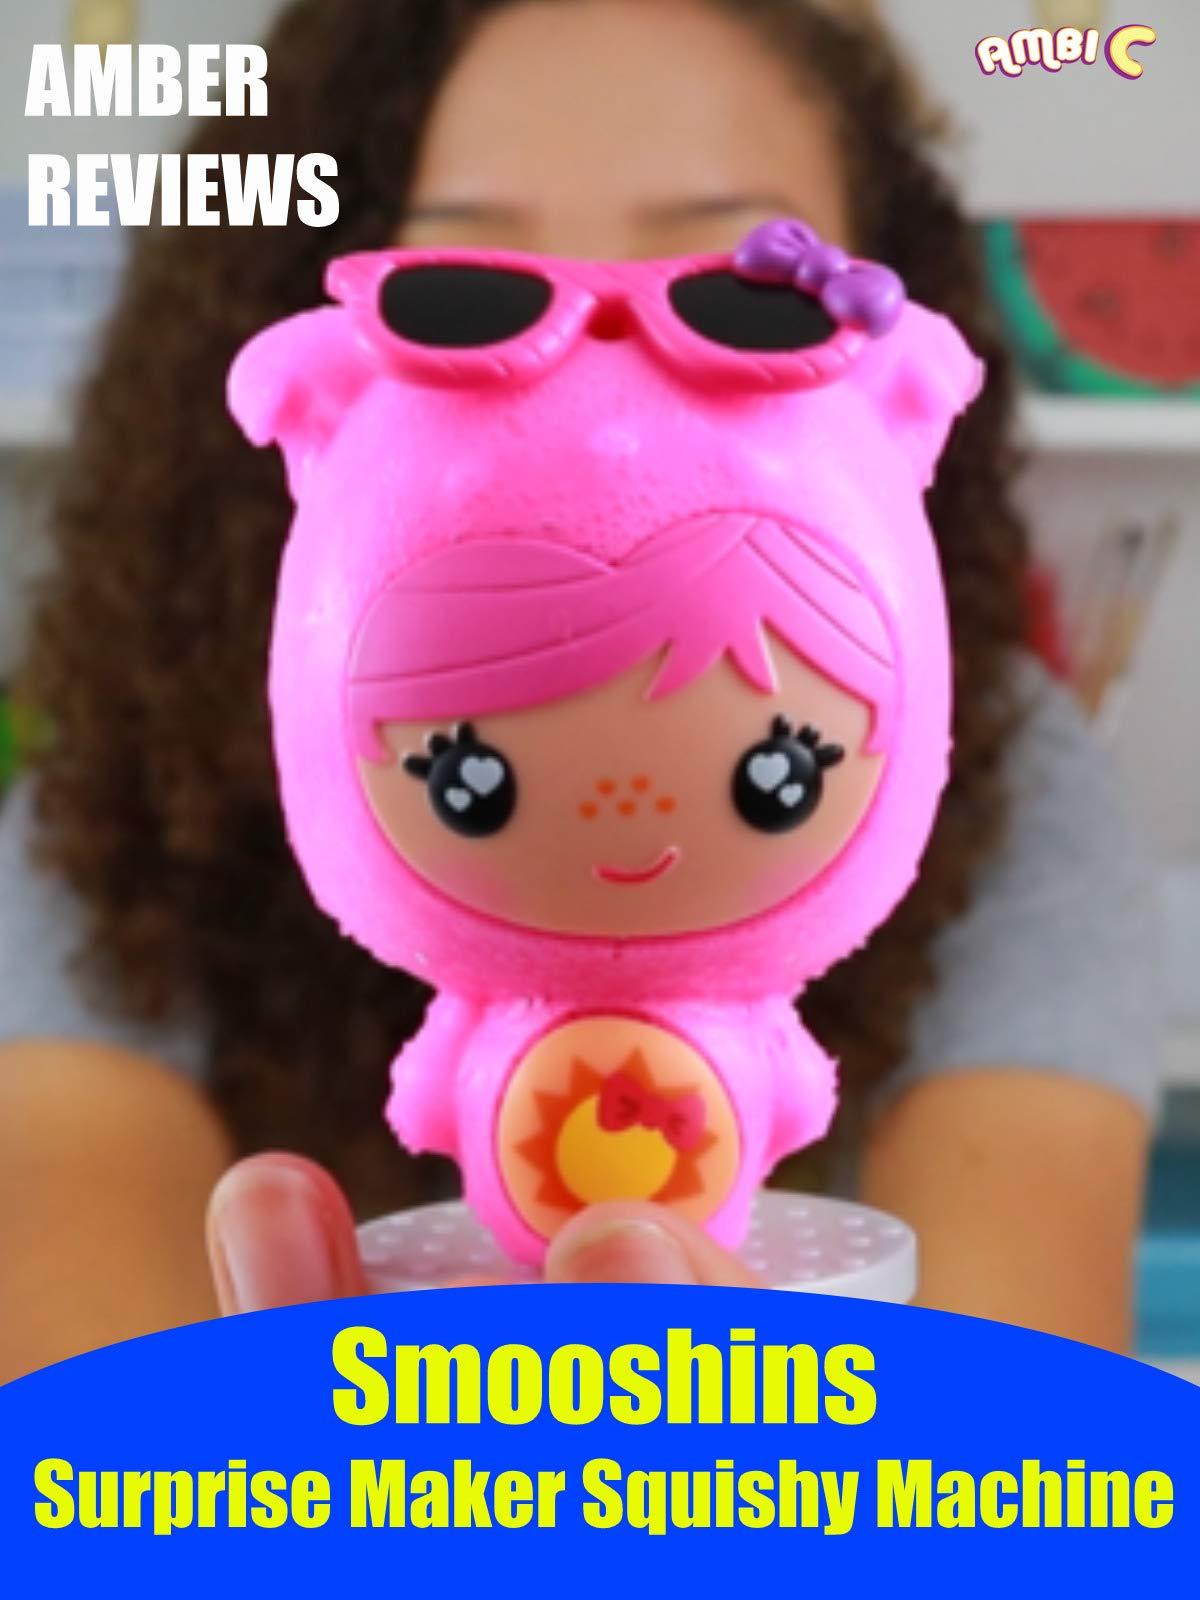 Amber Reviews Smooshins Surprise Maker Squishy Machine on Amazon Prime Instant Video UK